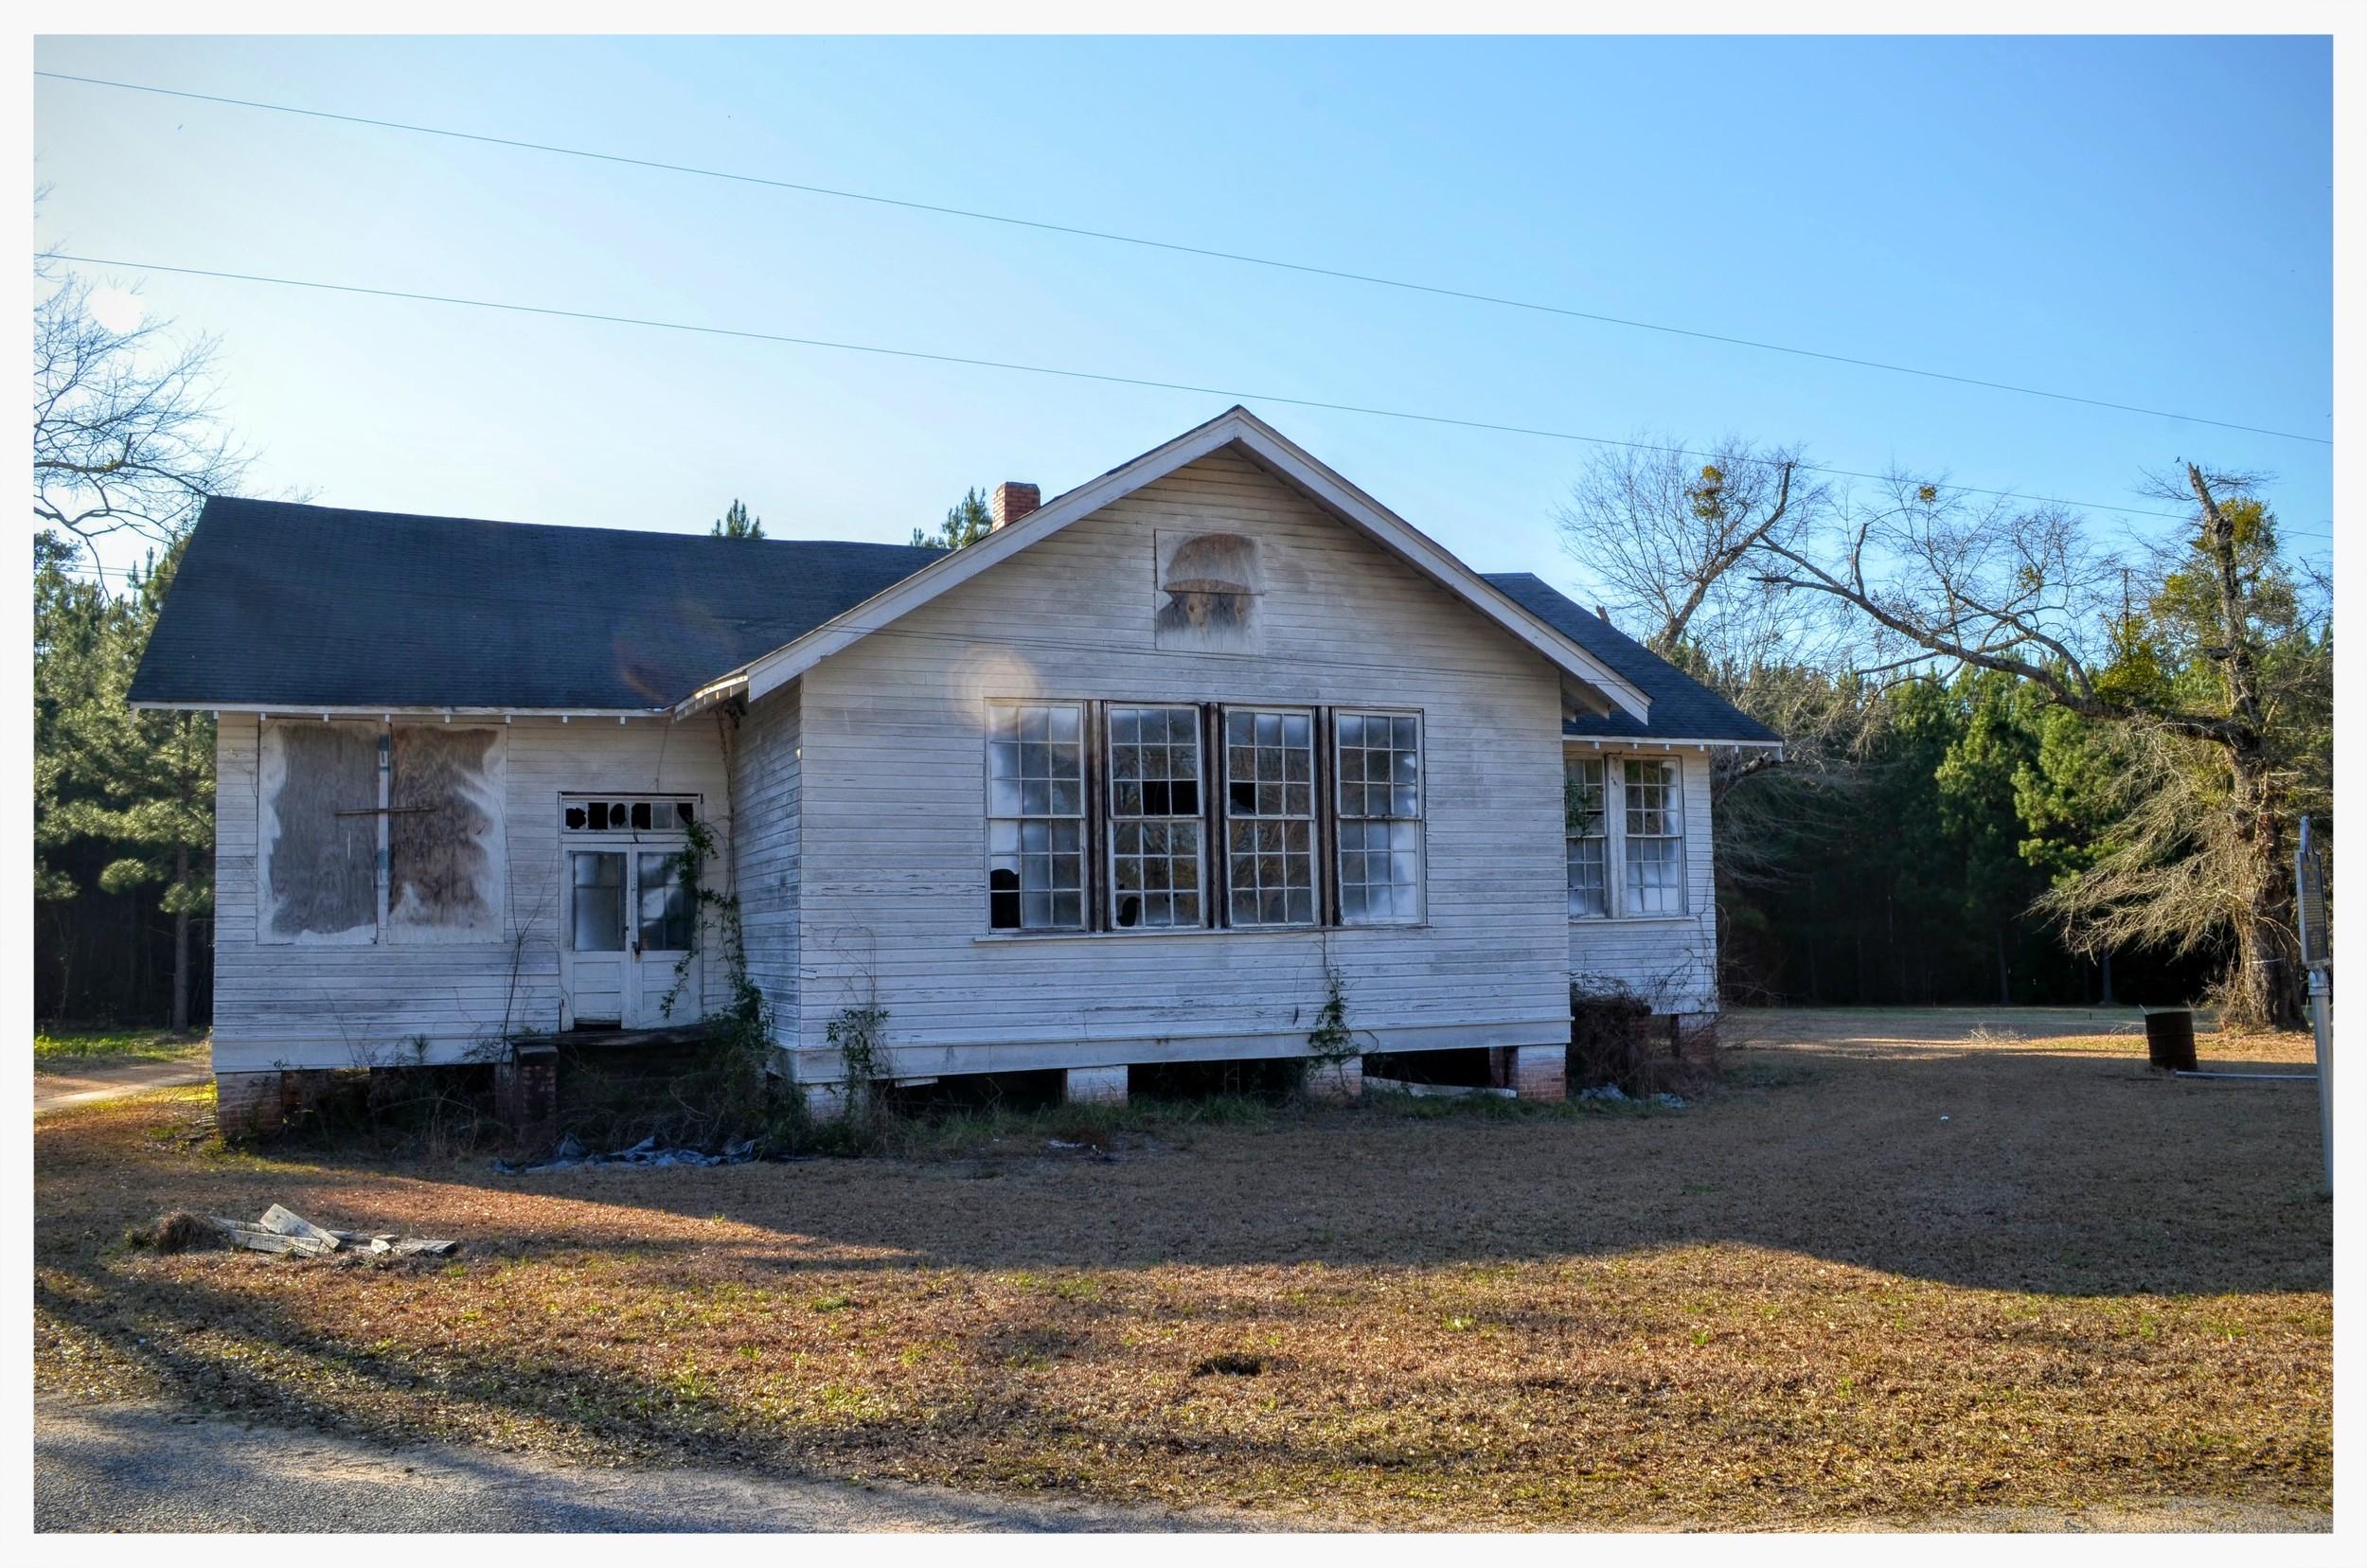 Tankersley Rosenwald School, Hope Hull, Montgomery County, Alabama